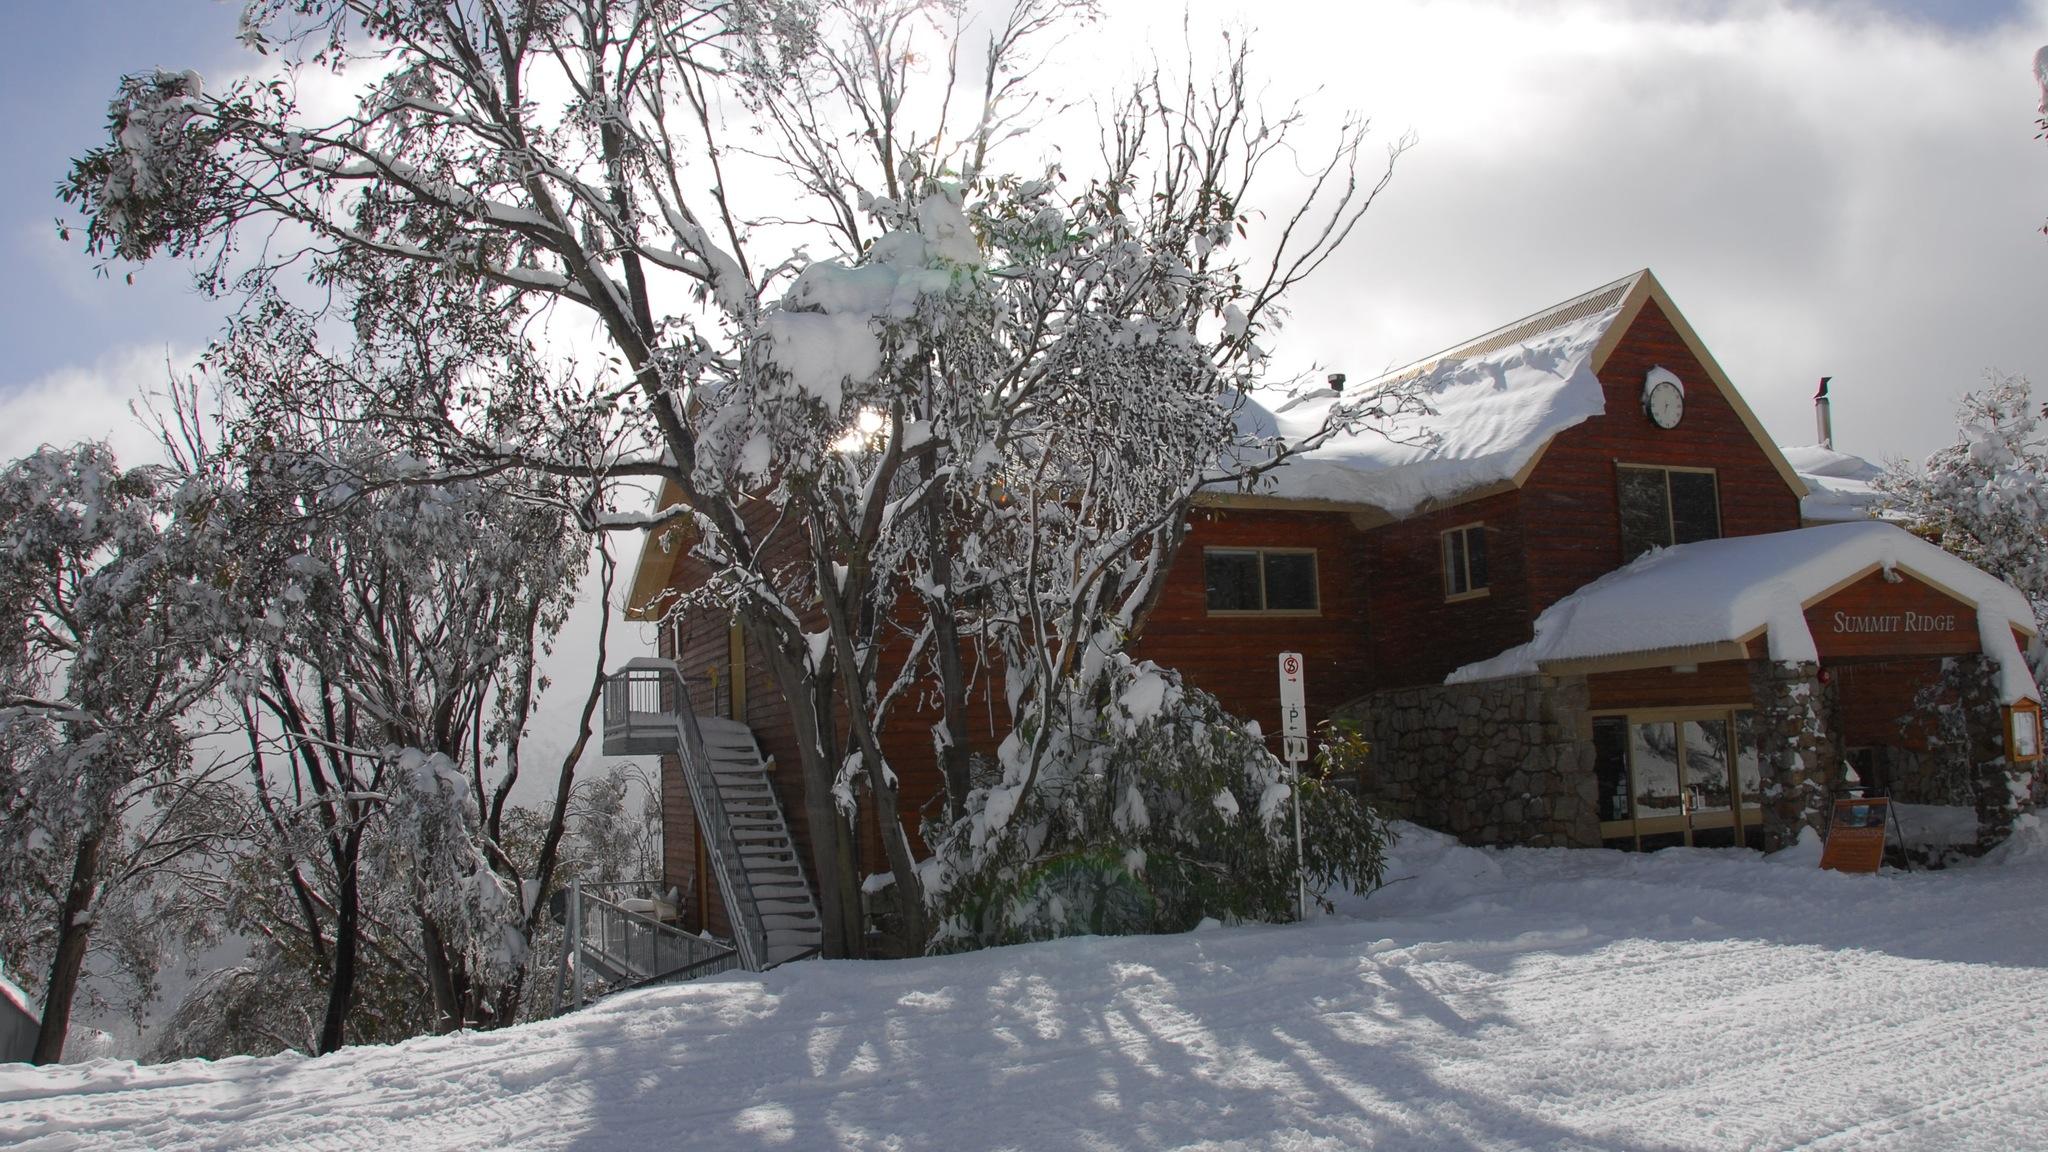 Summit Ridge Lodge, photographer Keith Archibald